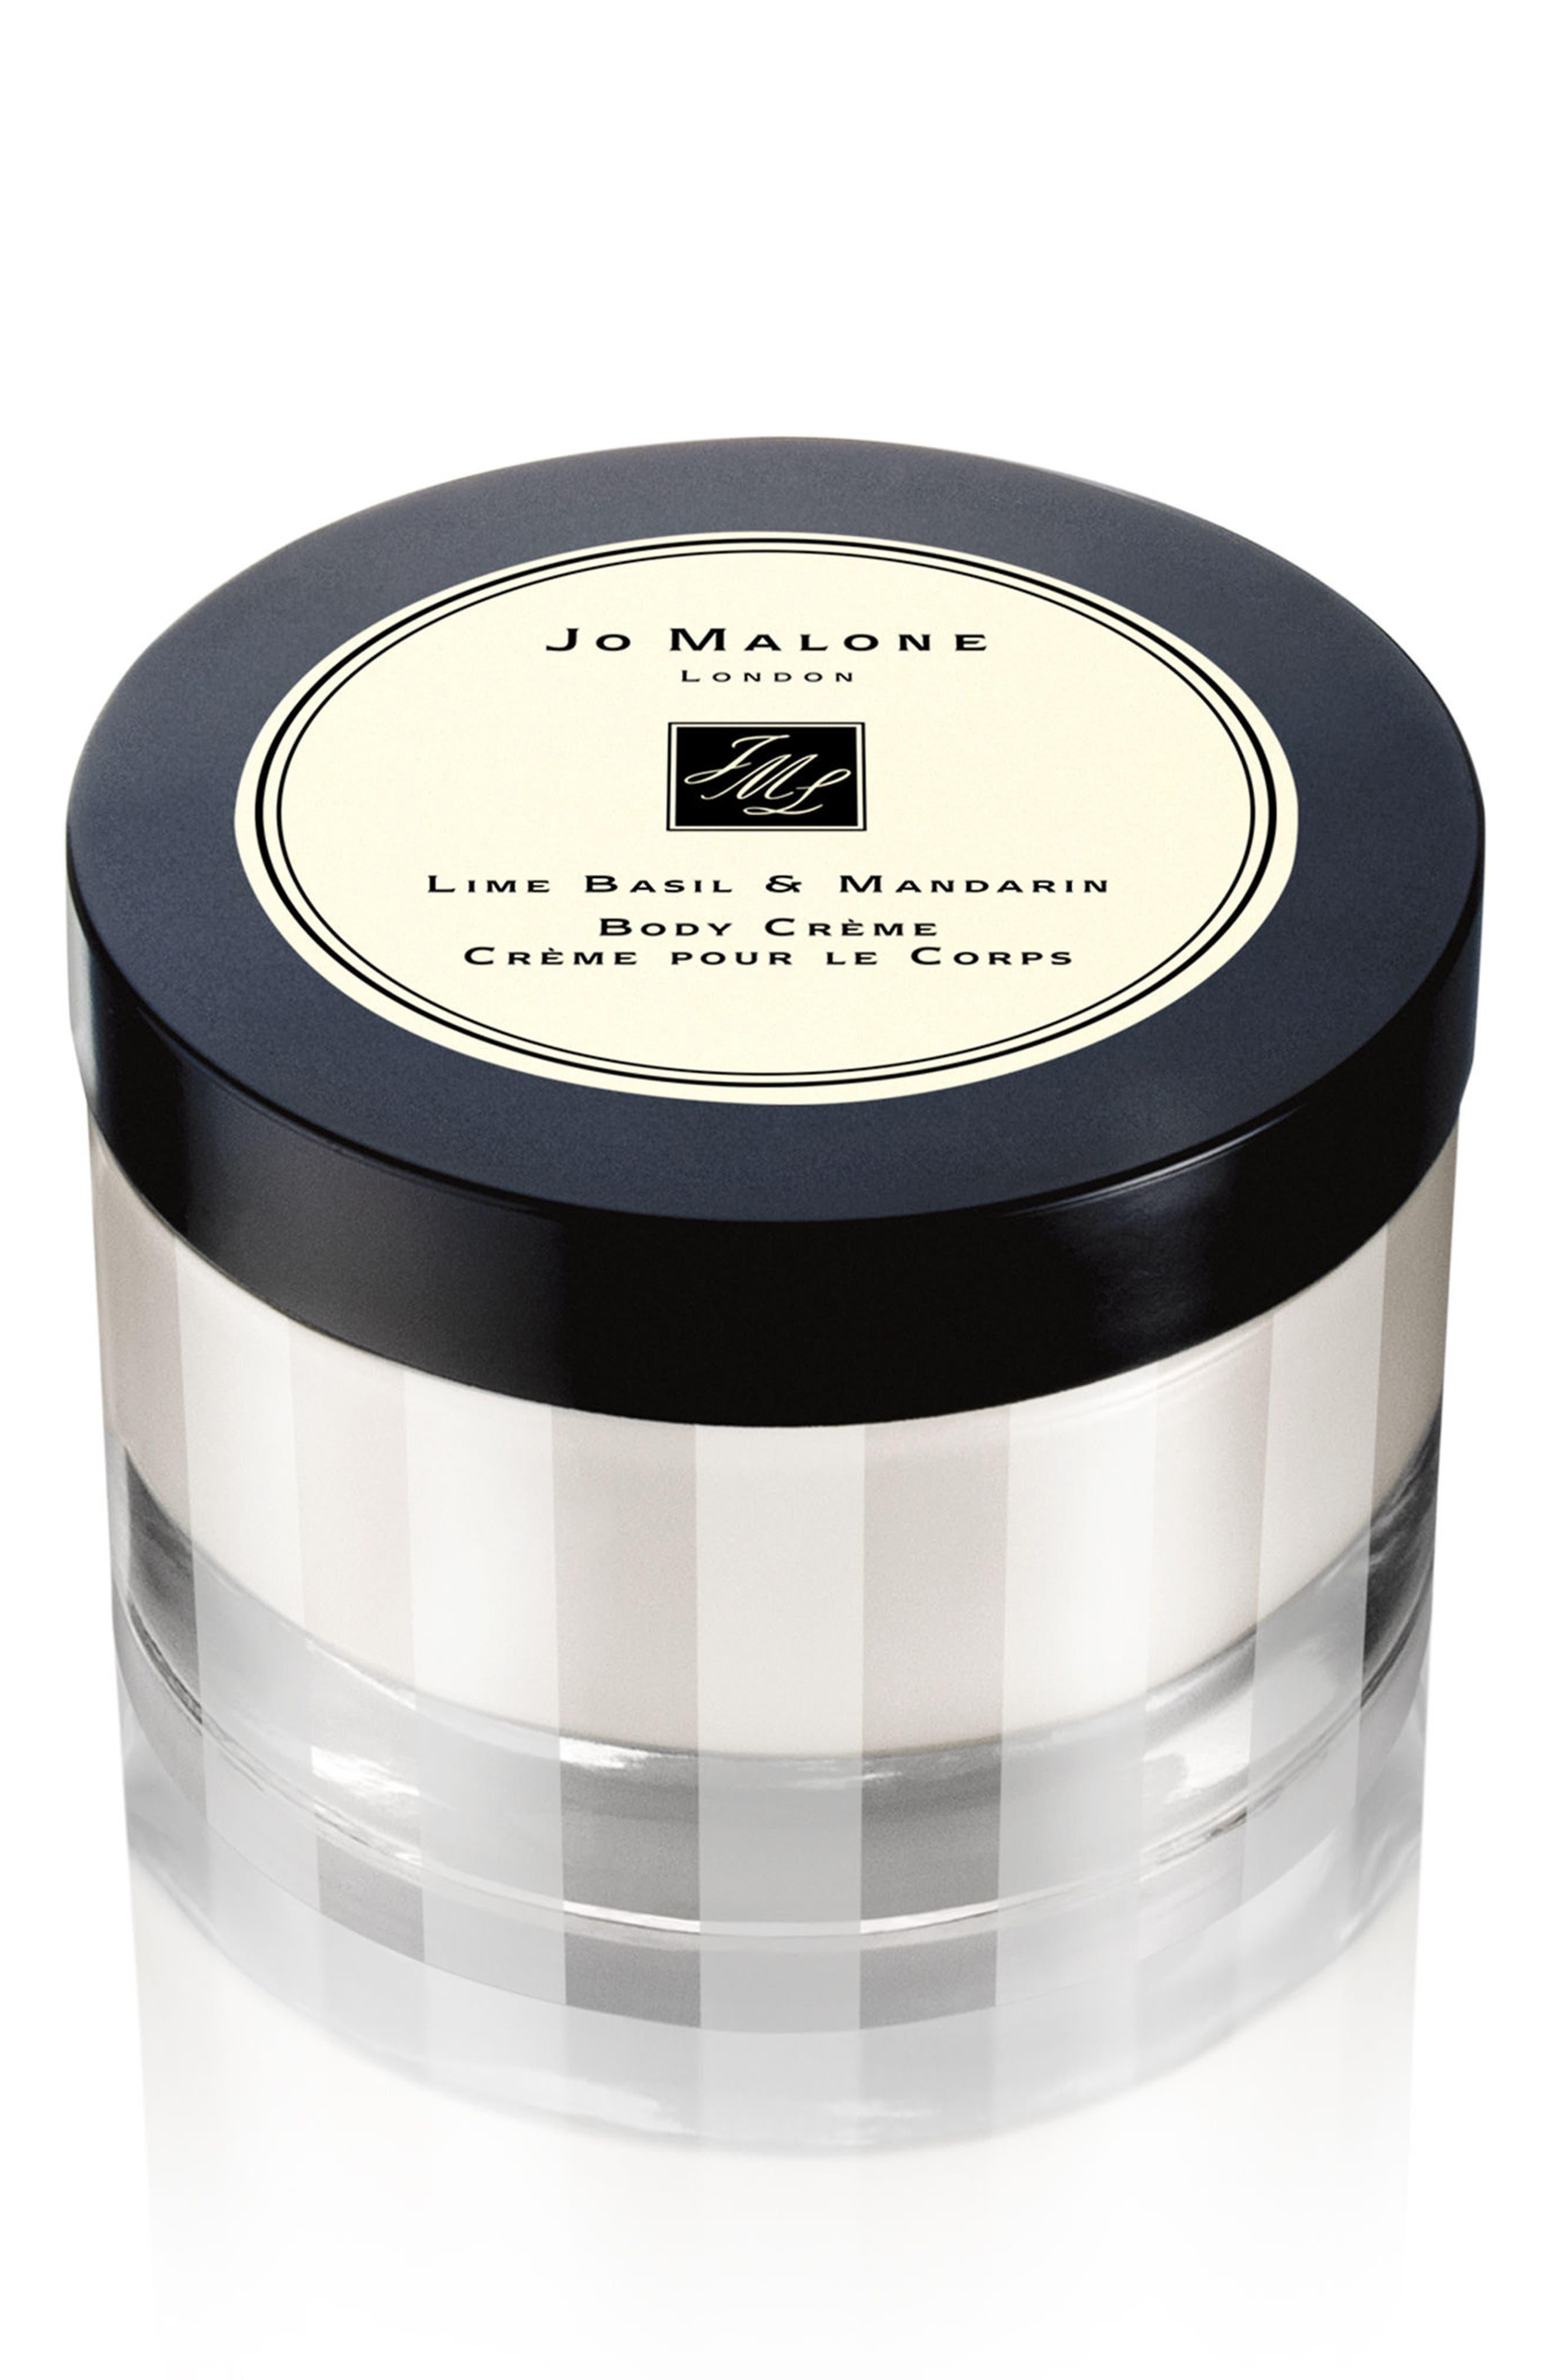 Main Image - Jo Malone London™ Lime Basil & Mandarin Body Crème